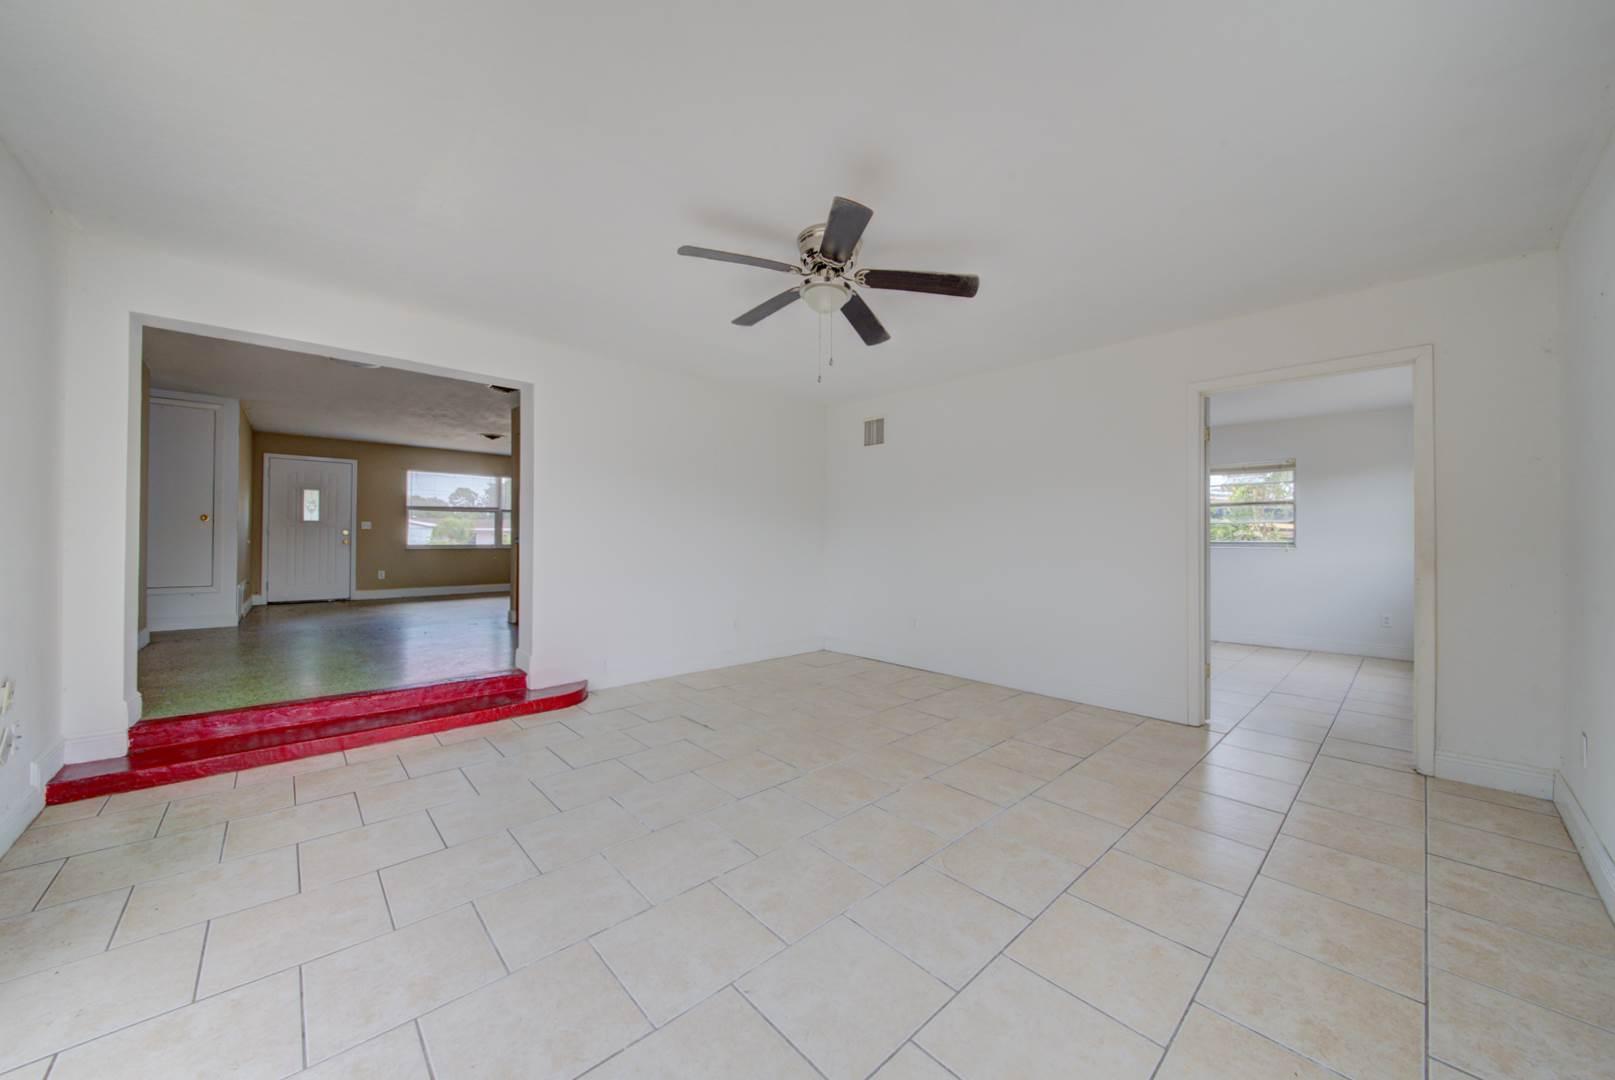 4755 Key Madeira, Titusville, FL 32780